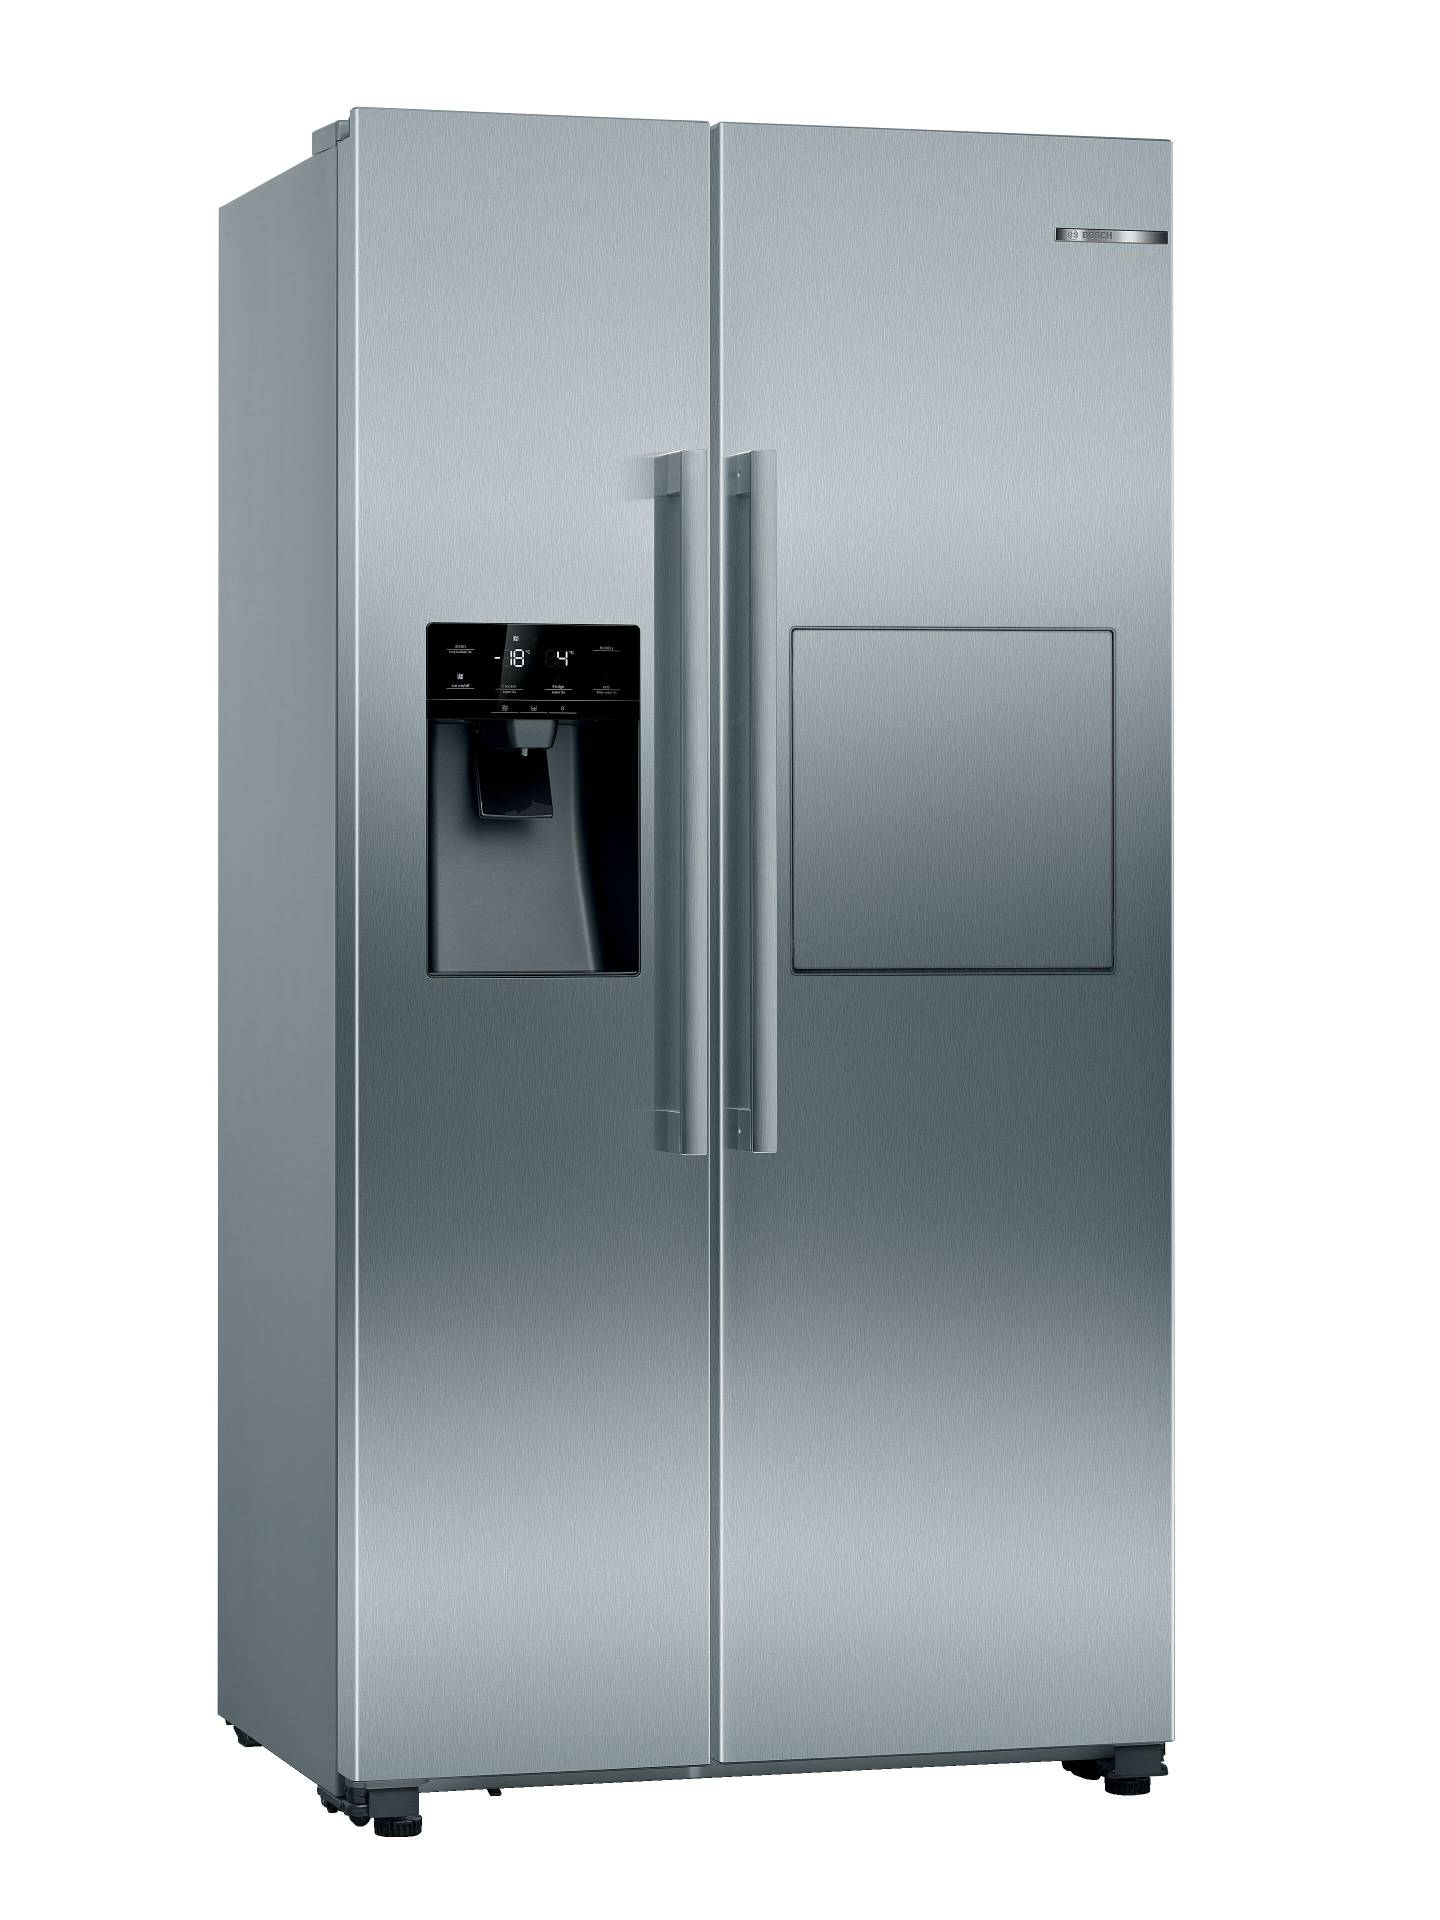 Tủ lạnh 2 cánh Side By Side HMH.KAG93AIEPG Series 6